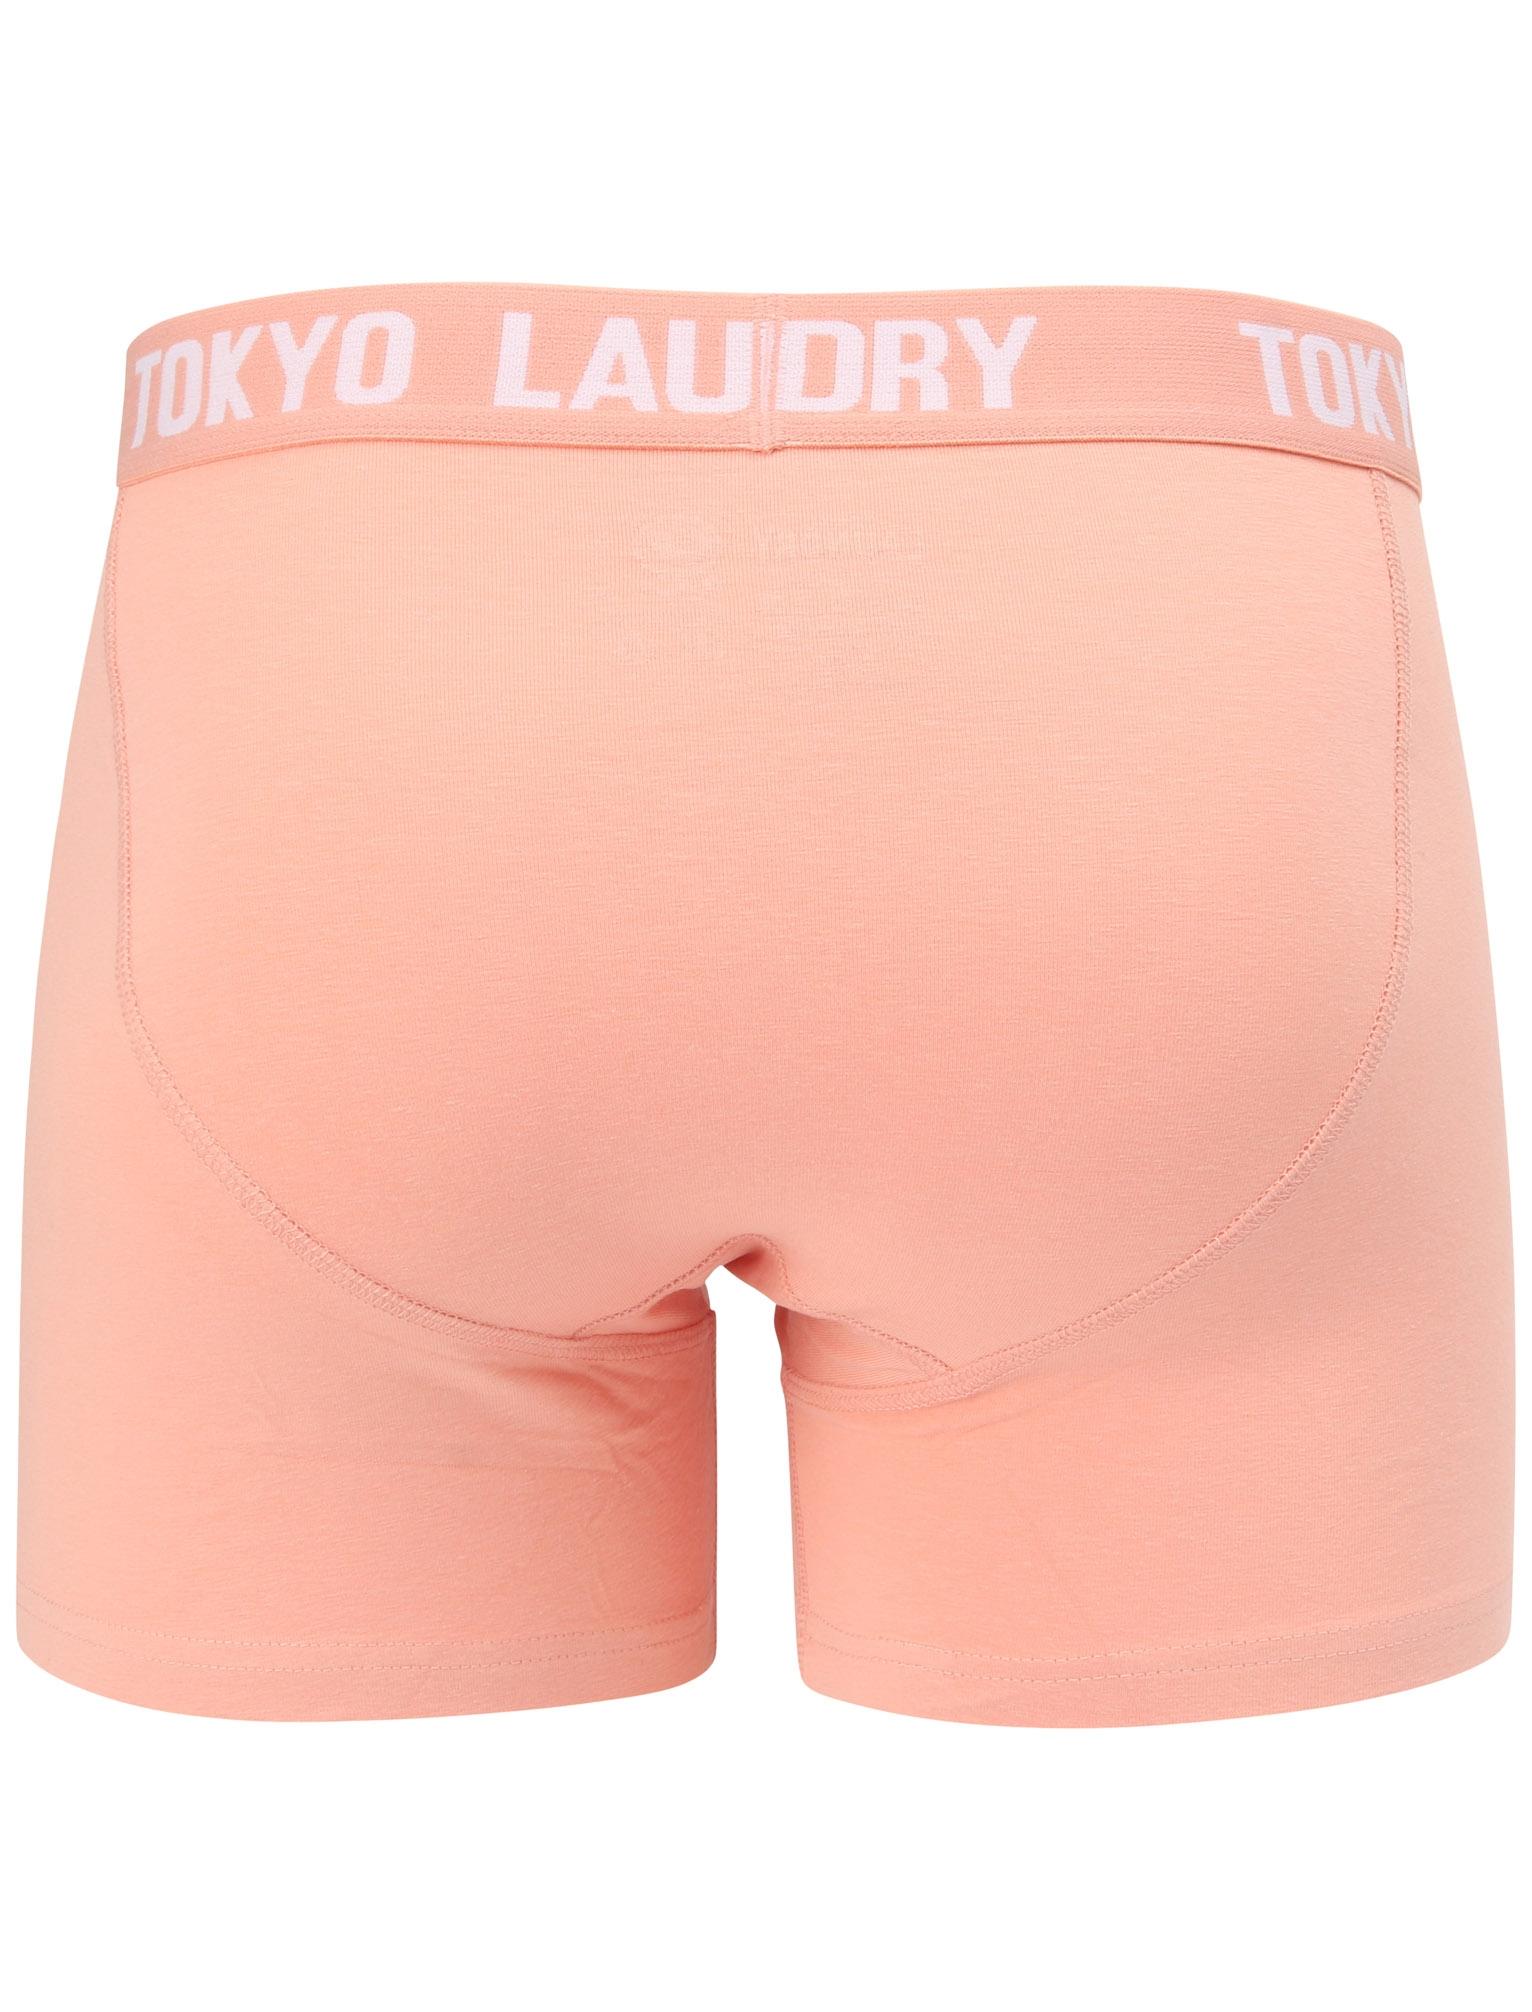 New-Mens-Tokyo-Laundry-Nash-2-Pack-Buttoned-Cotton-Boxer-Shorts-Set-Size-S-XXL thumbnail 6